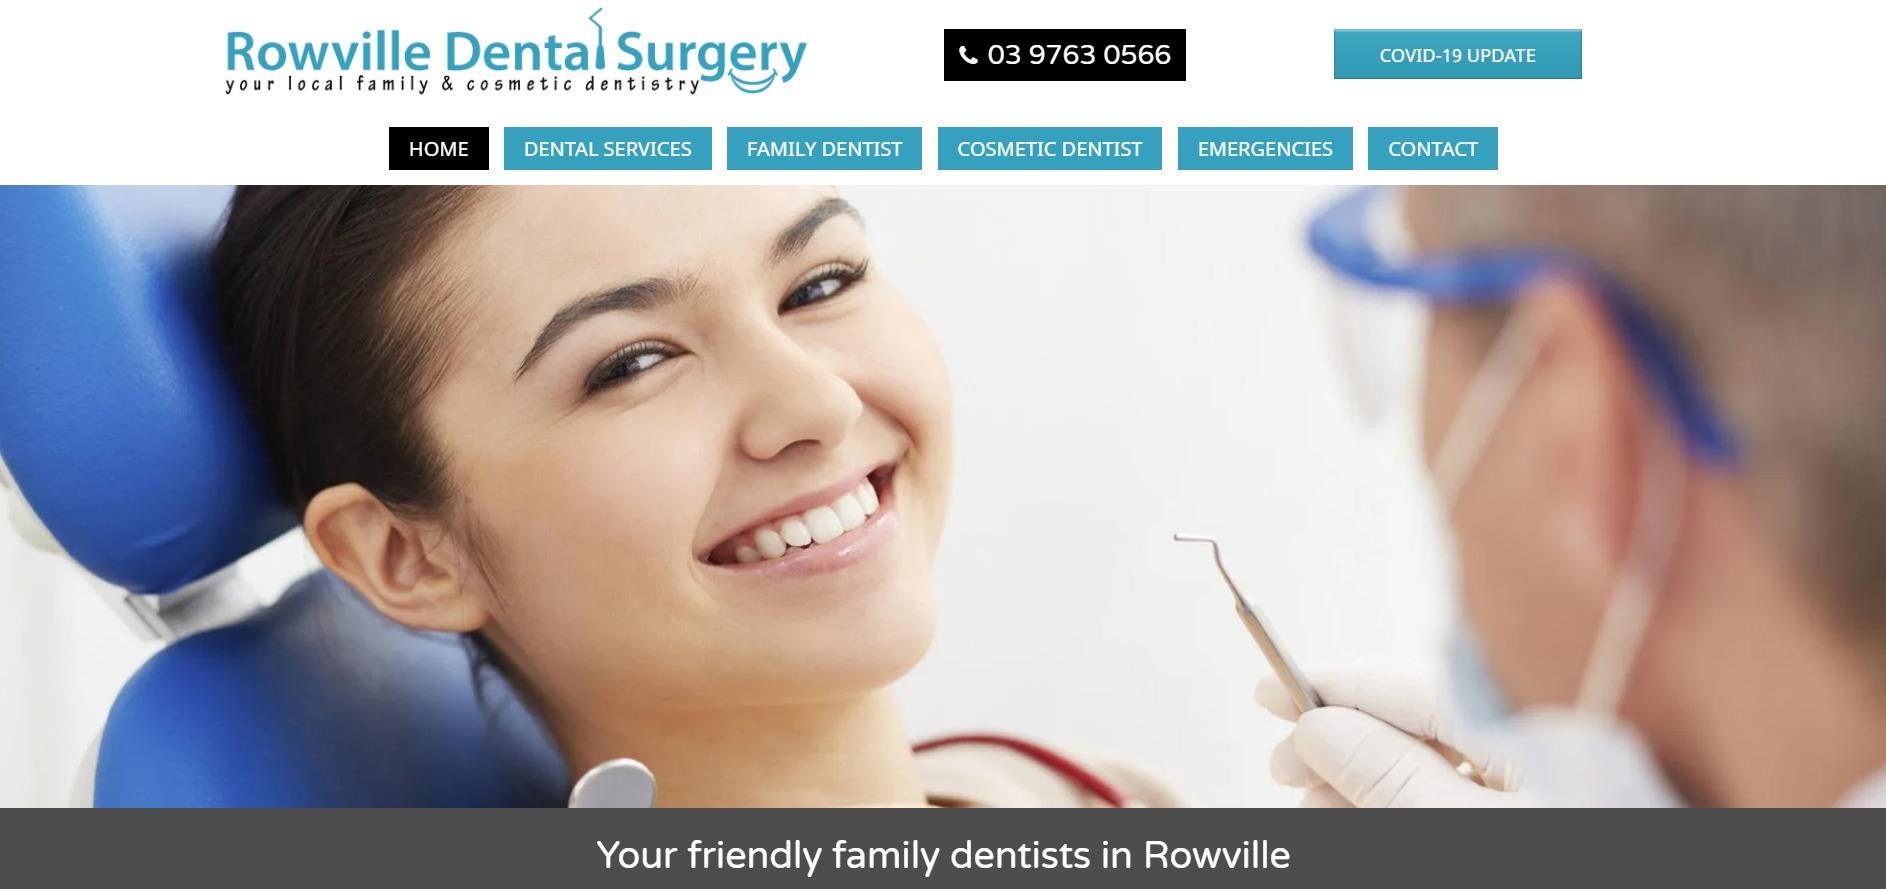 Rowville Dental Surgery